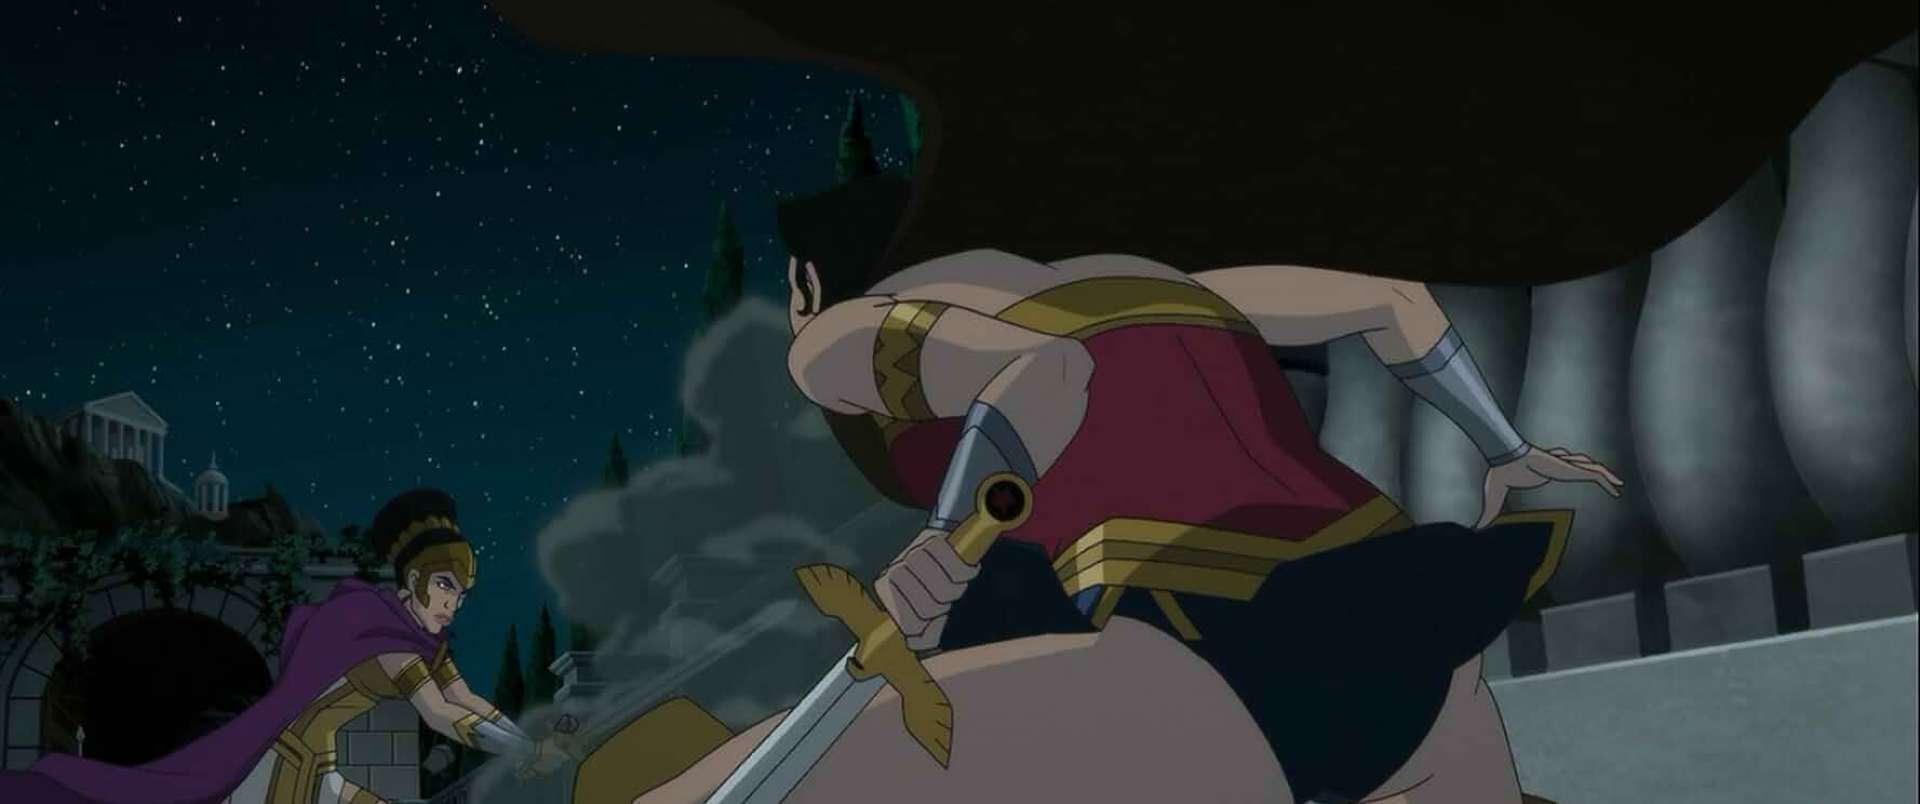 Wonder Woman: Bloodlines Google Drive Link